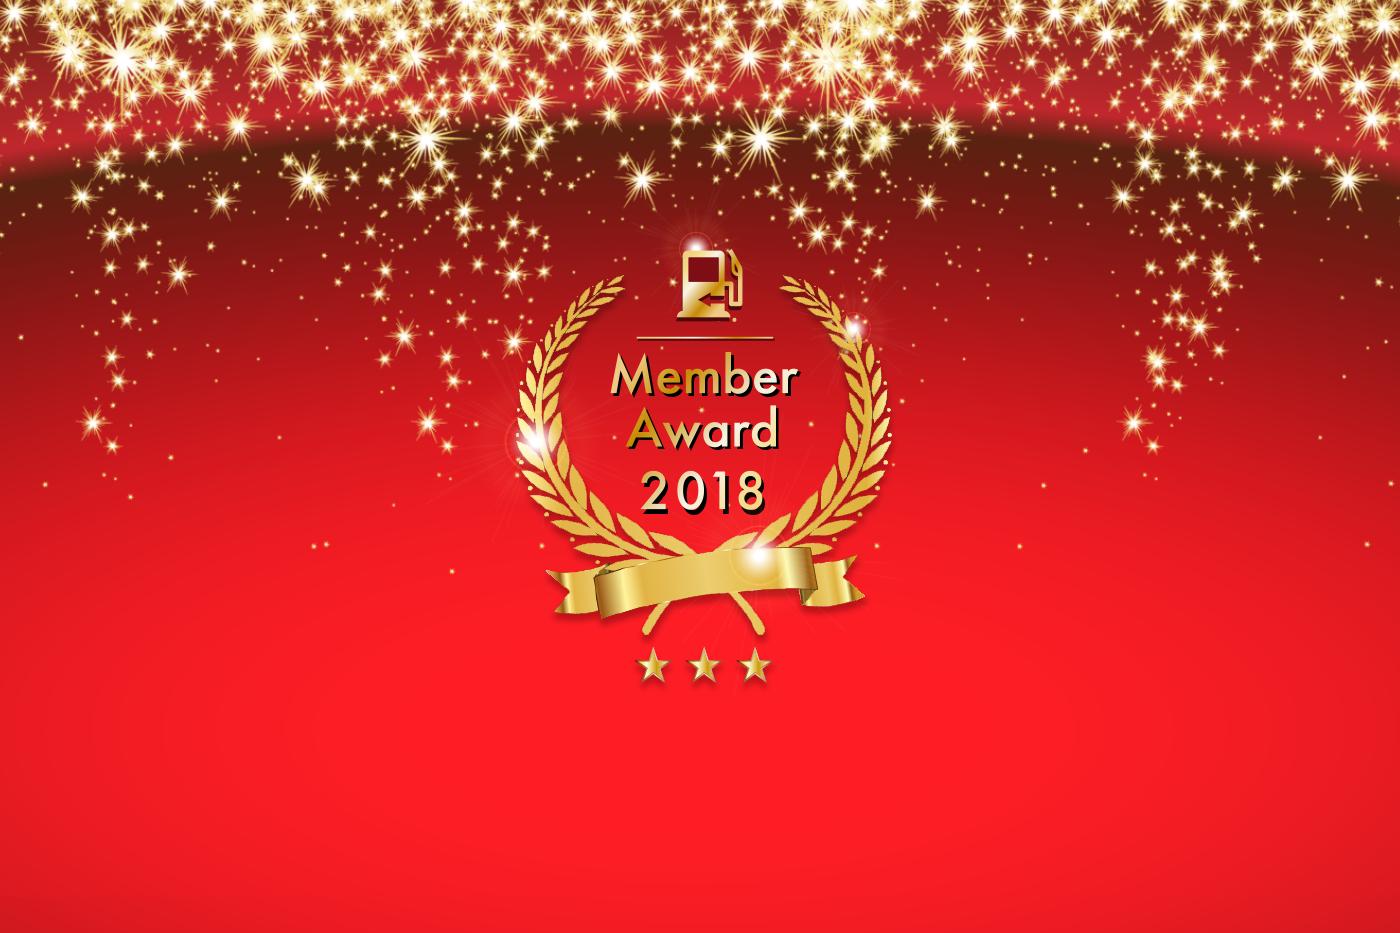 gogo.gs Member Award 2018